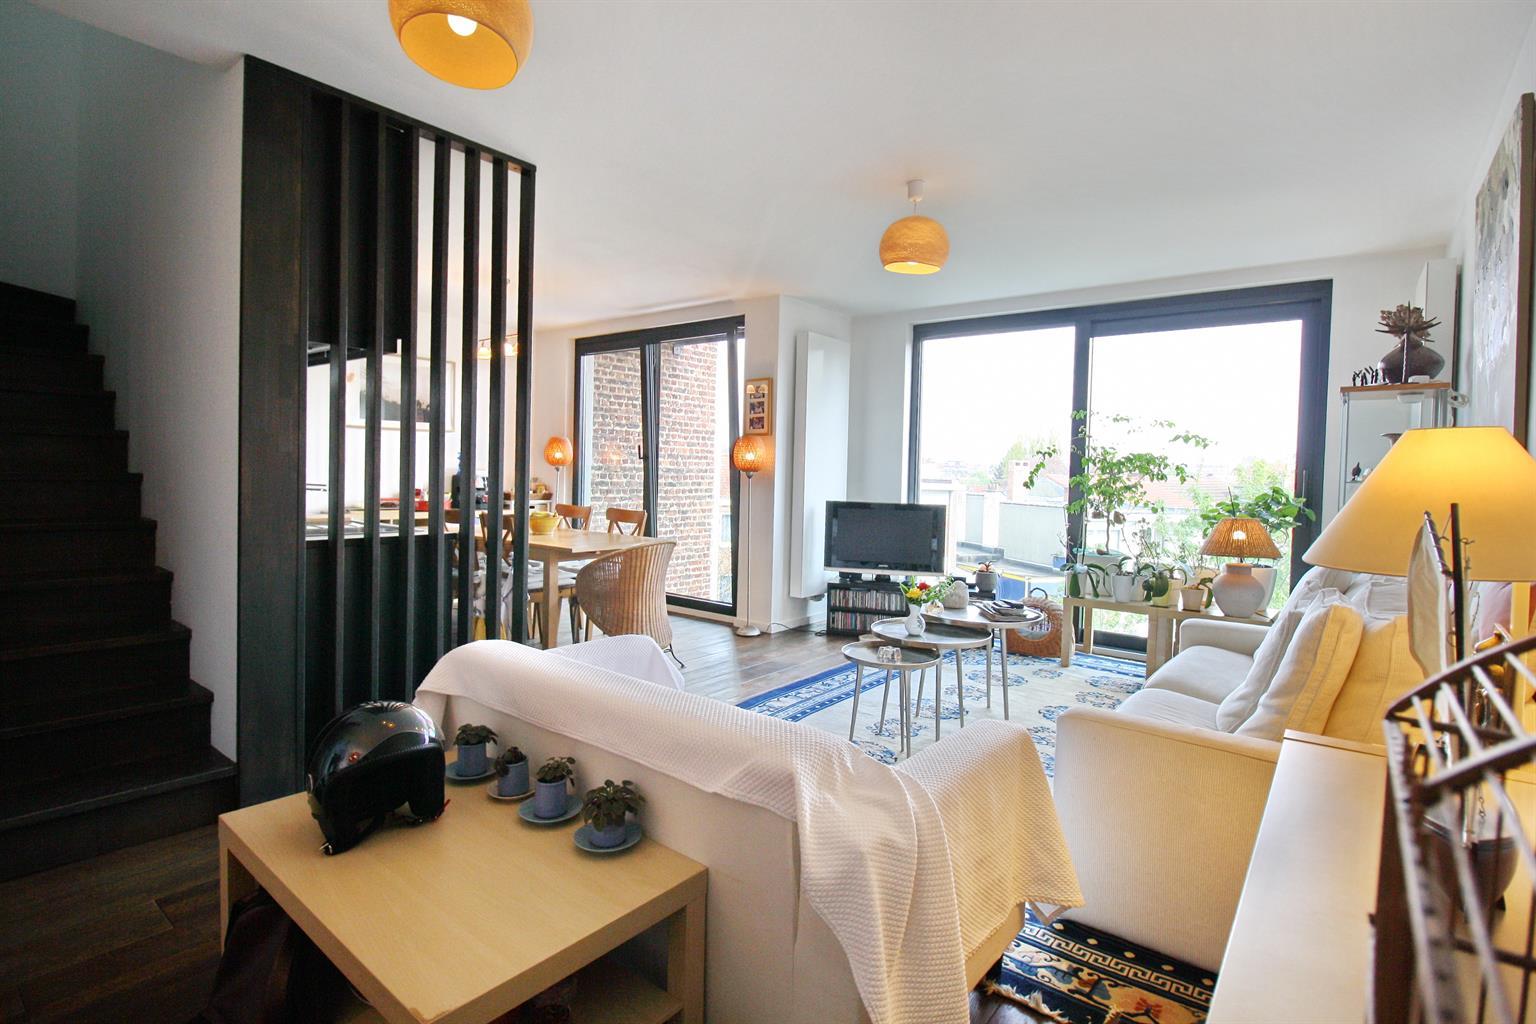 Penthouse - Berchem-Sainte-Agathe - #4346071-4